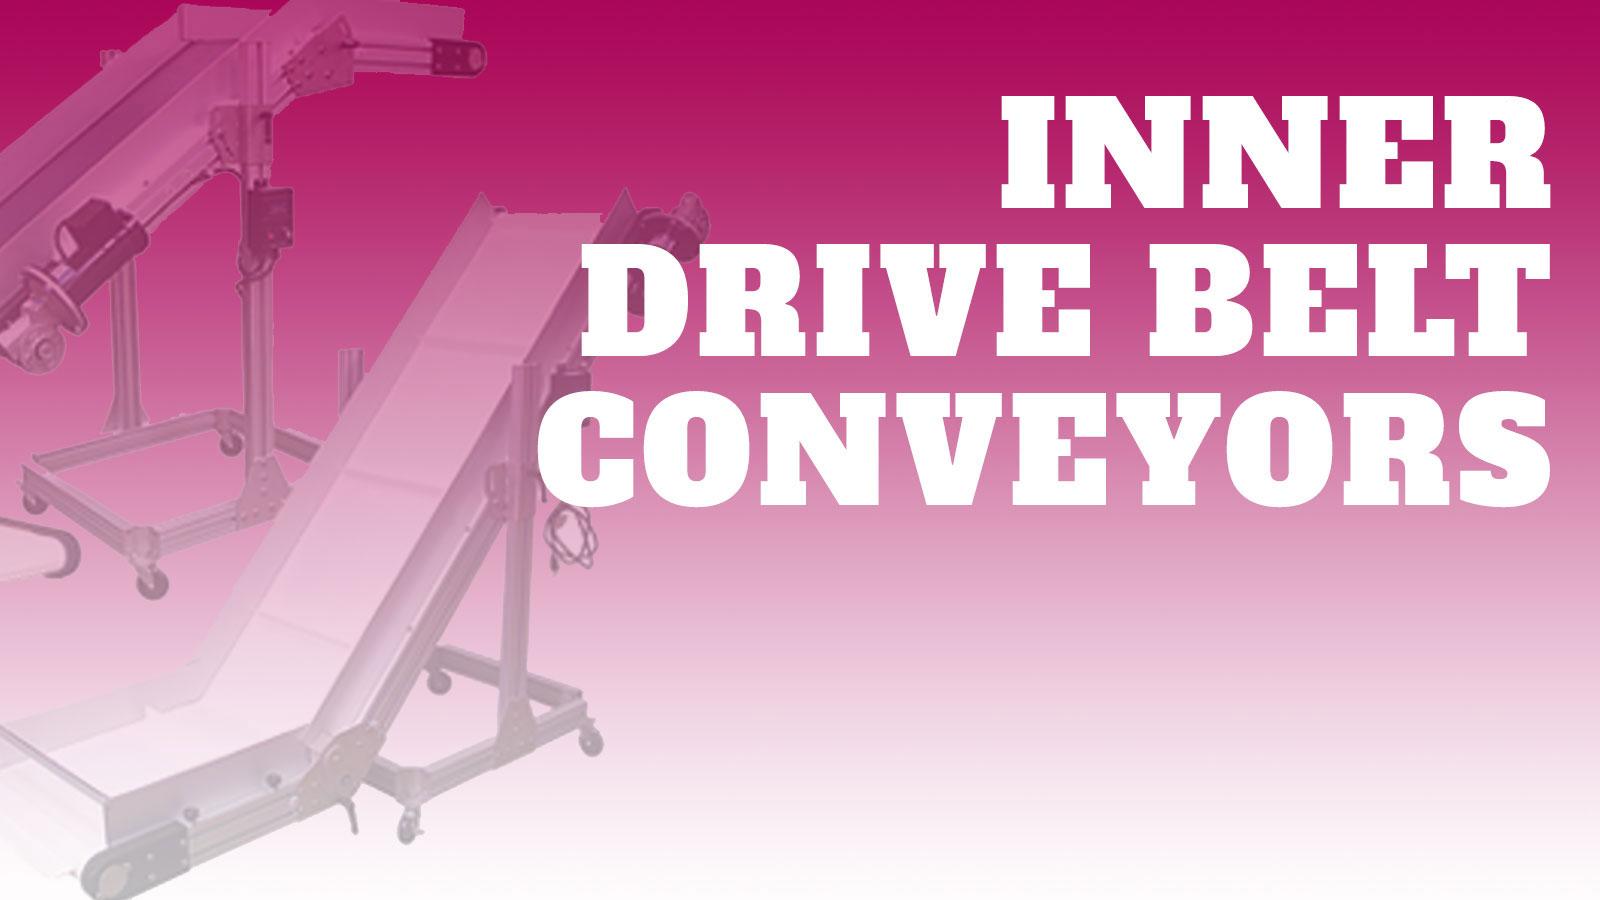 Conveyor-Inner-Drive-Belt